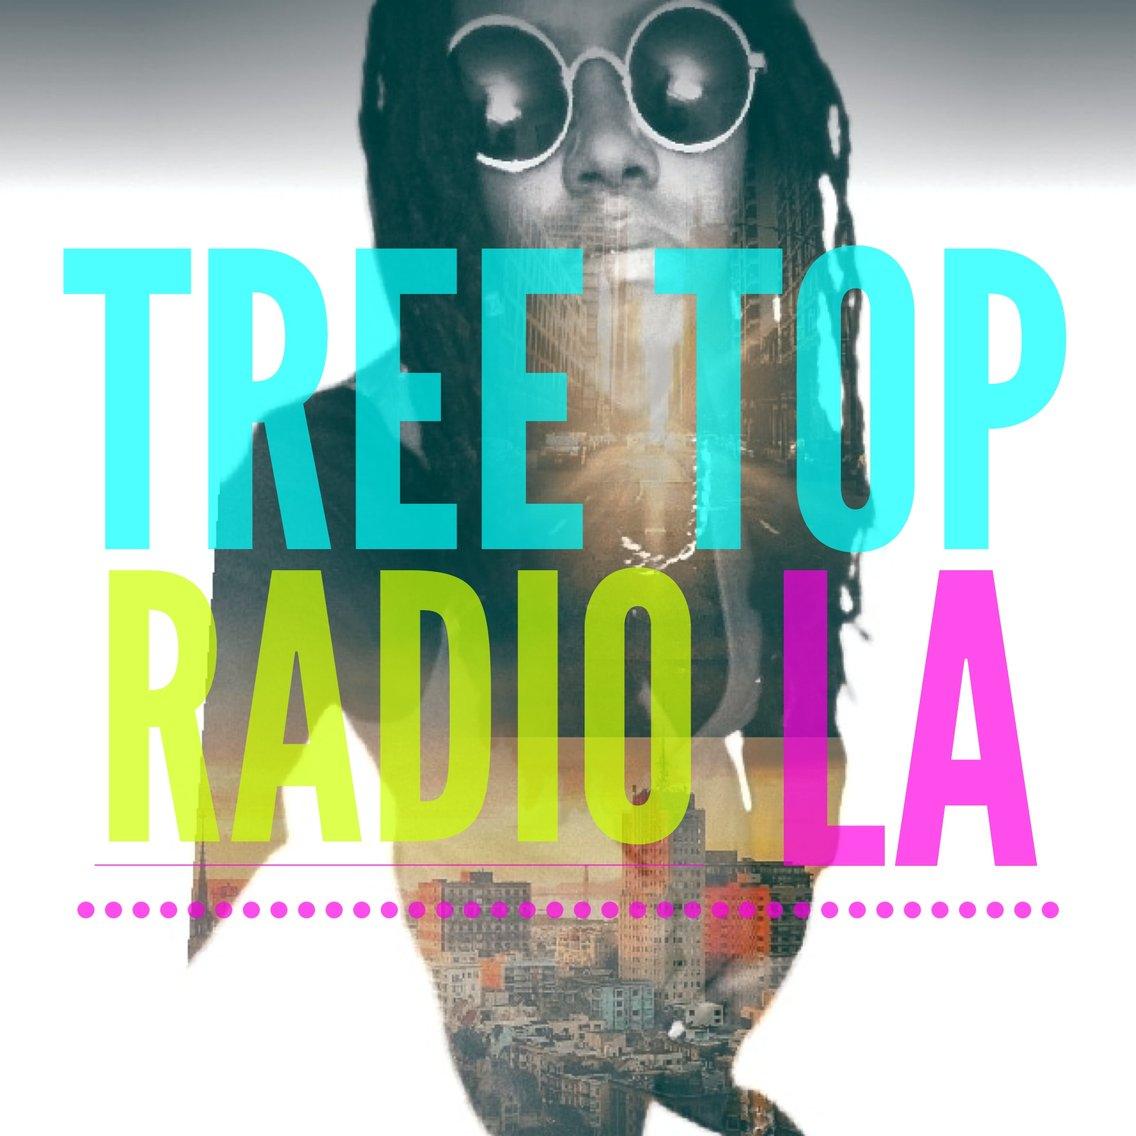 Tree Top Radio LA - imagen de portada